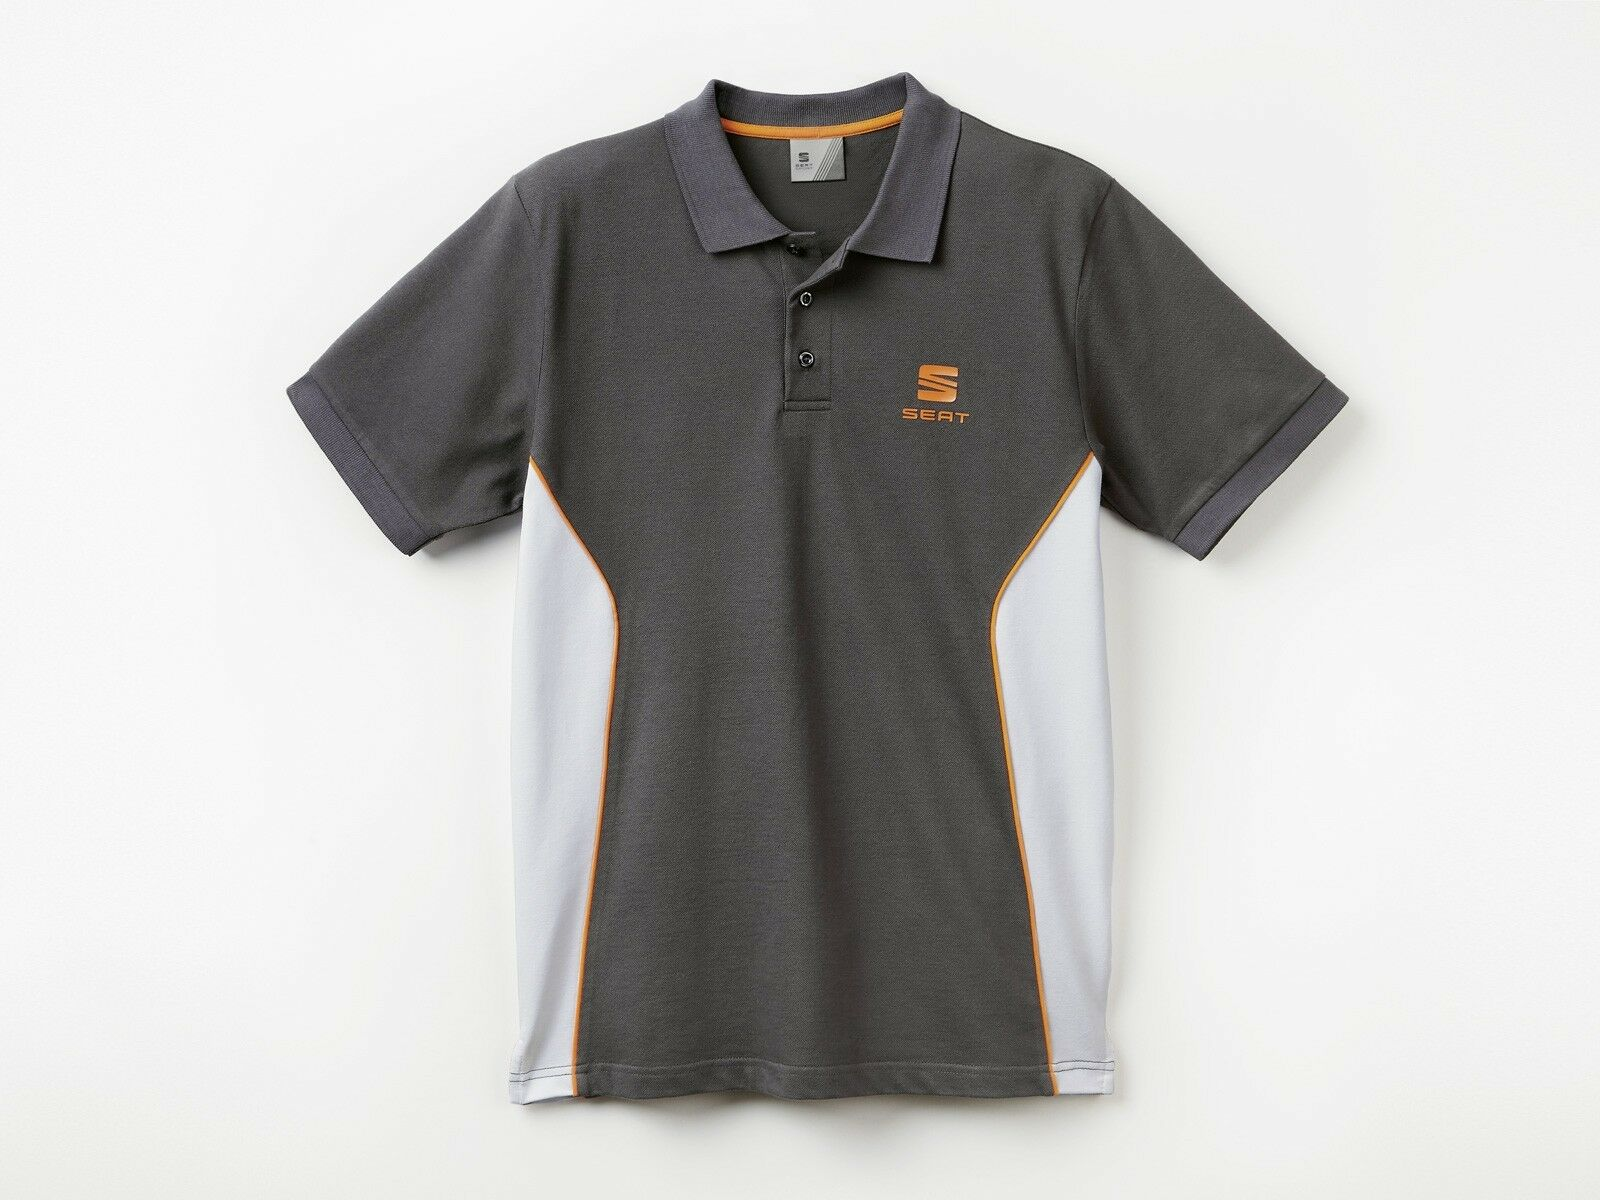 Genuine Seat Polo Shirt Men's Grey